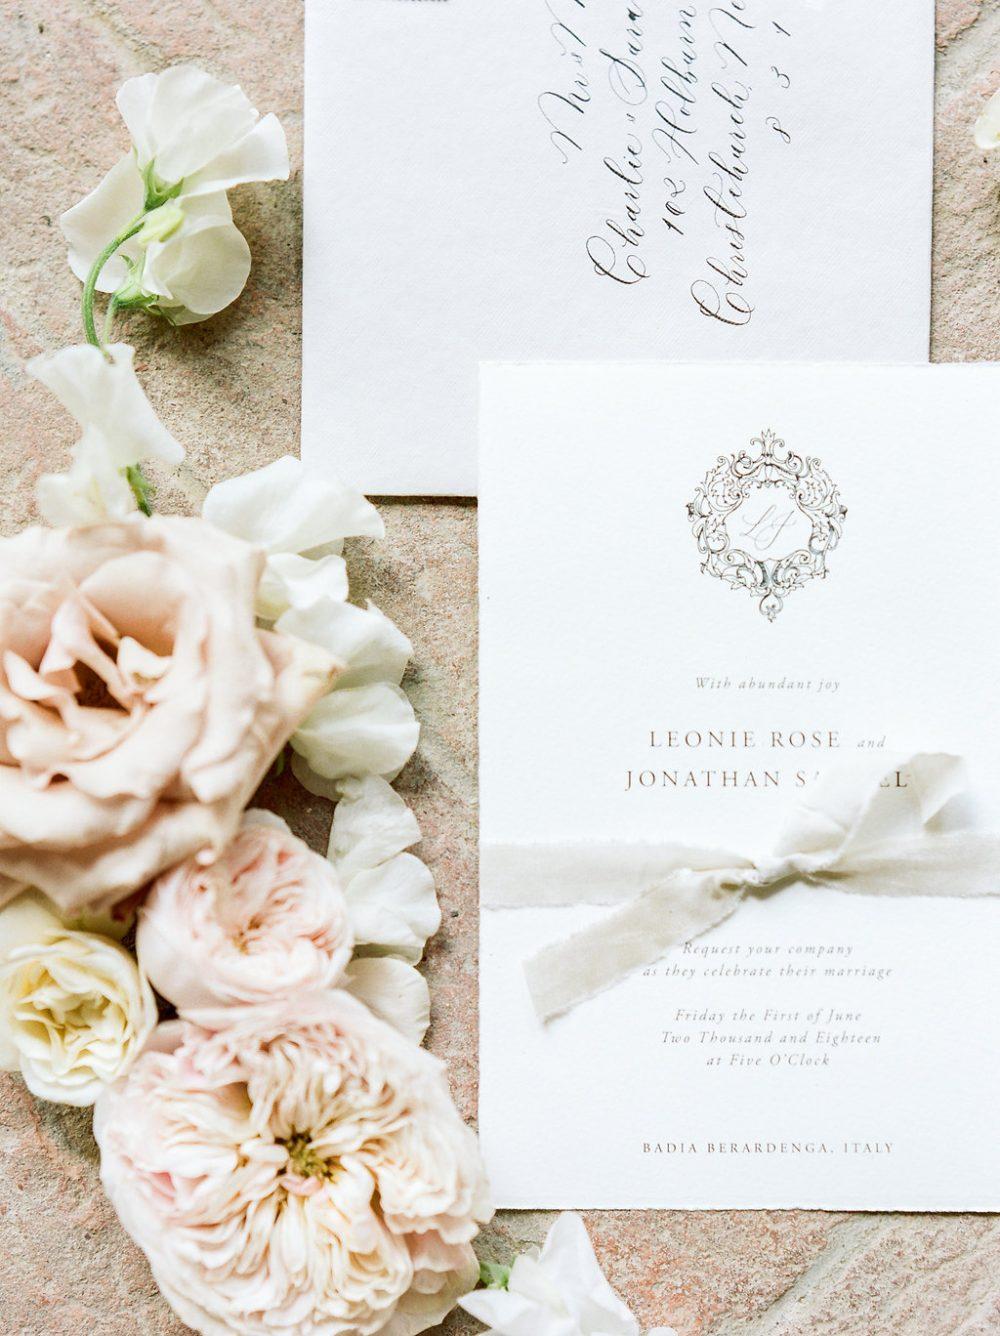 wedding invite calligraphy flat lay